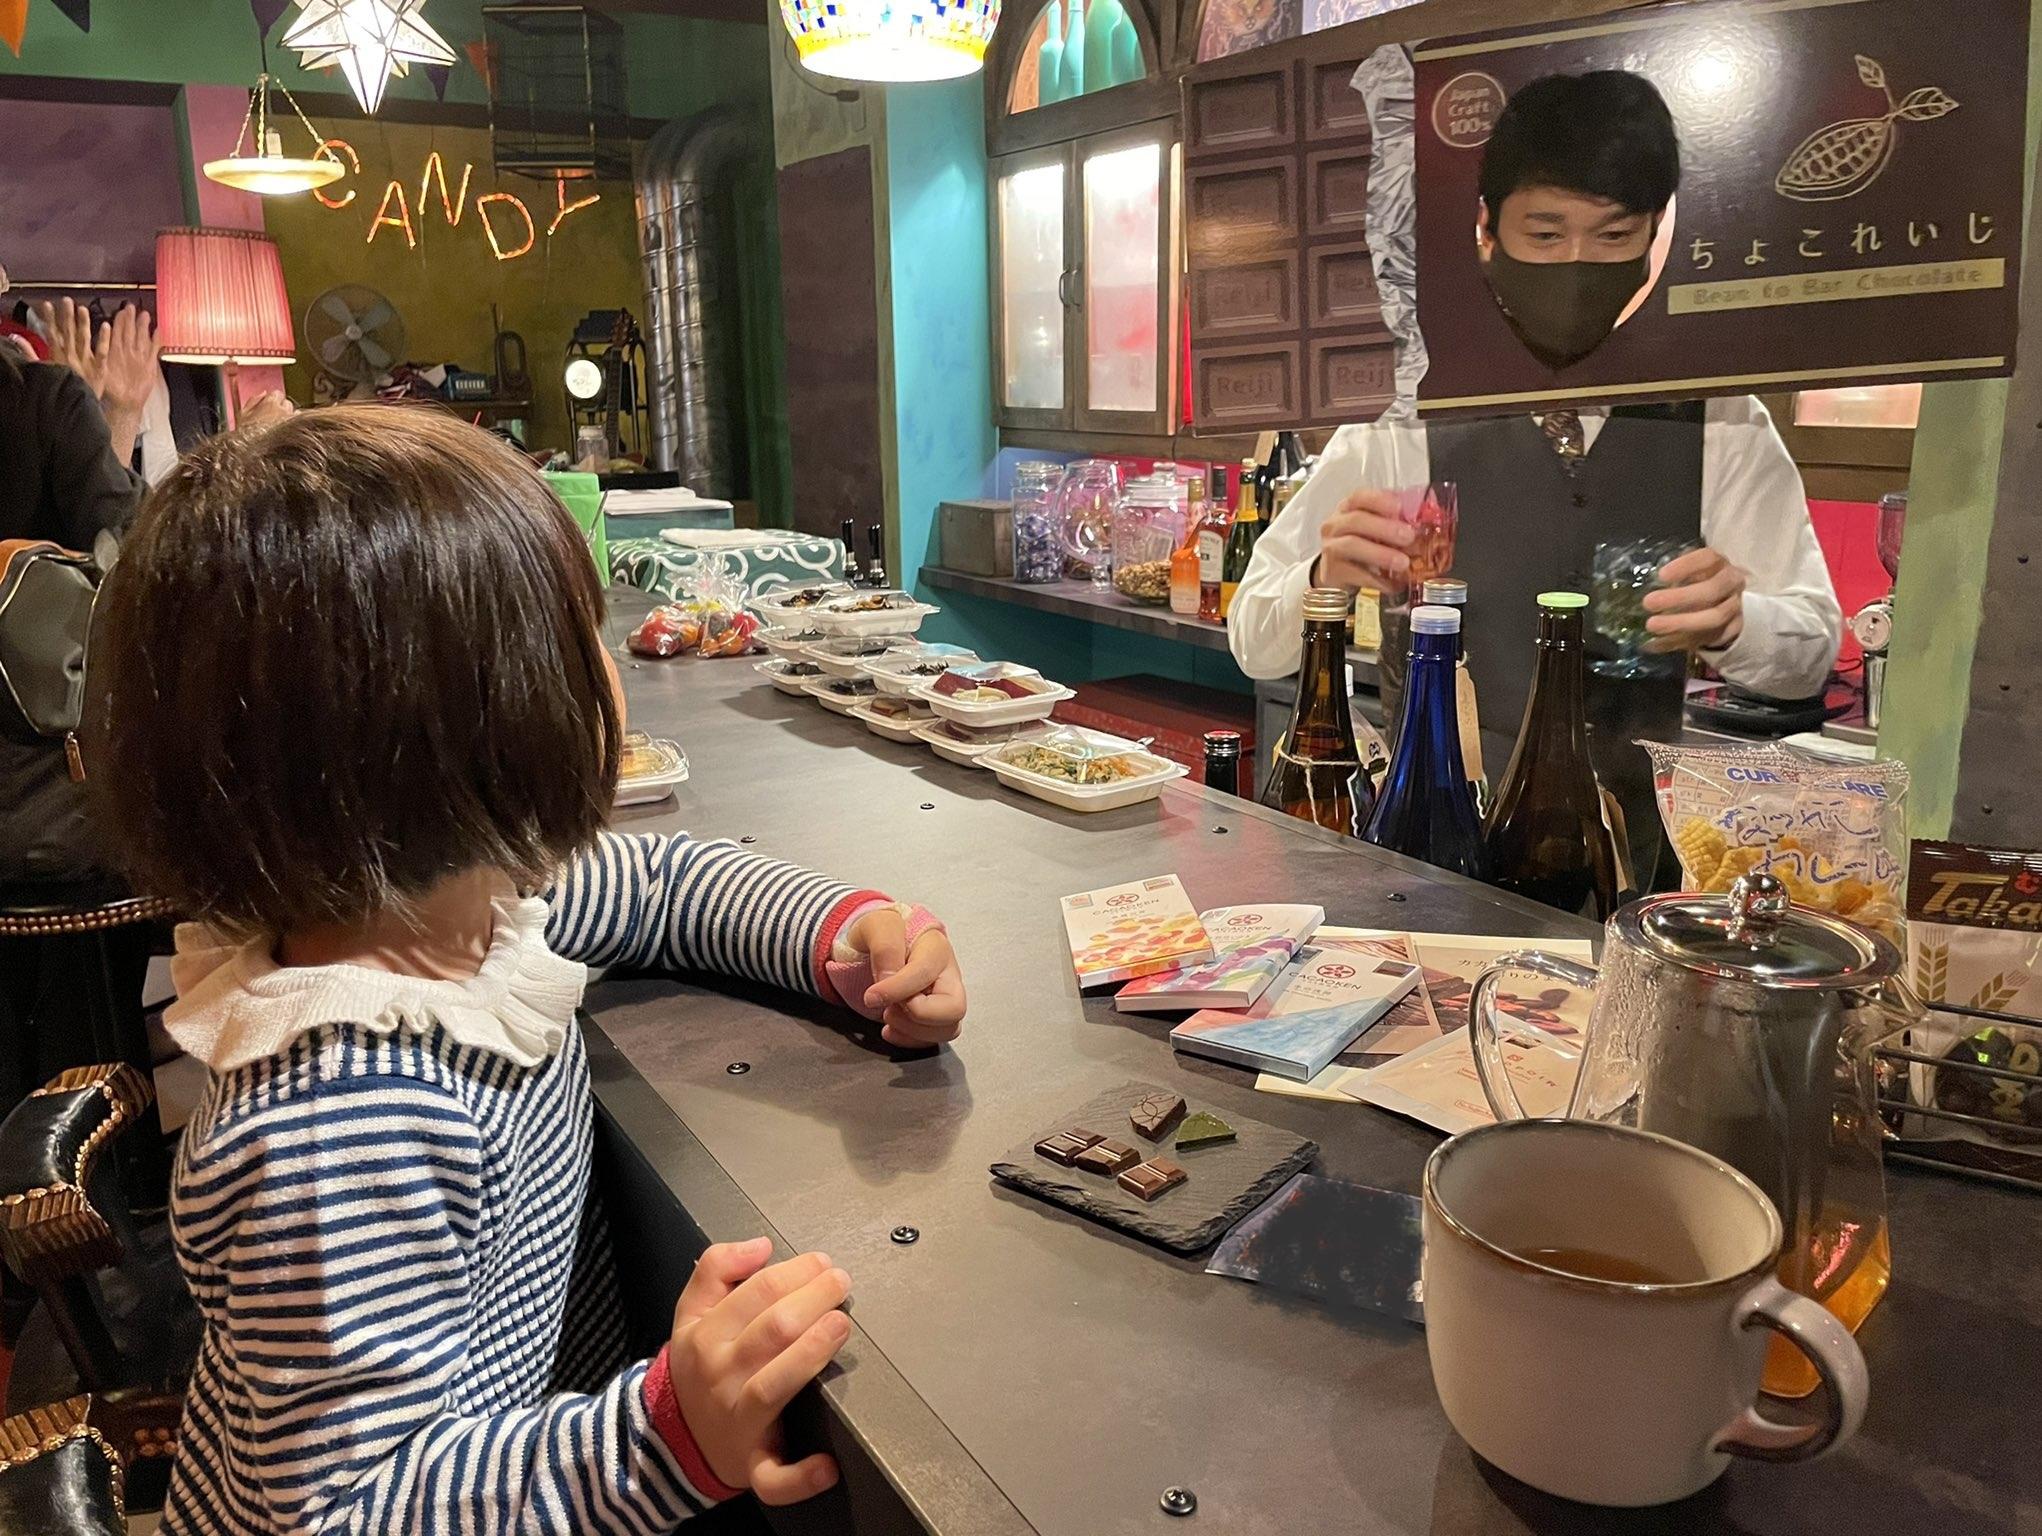 「Candy福岡×チョコレート」イベントが無事終了しました。